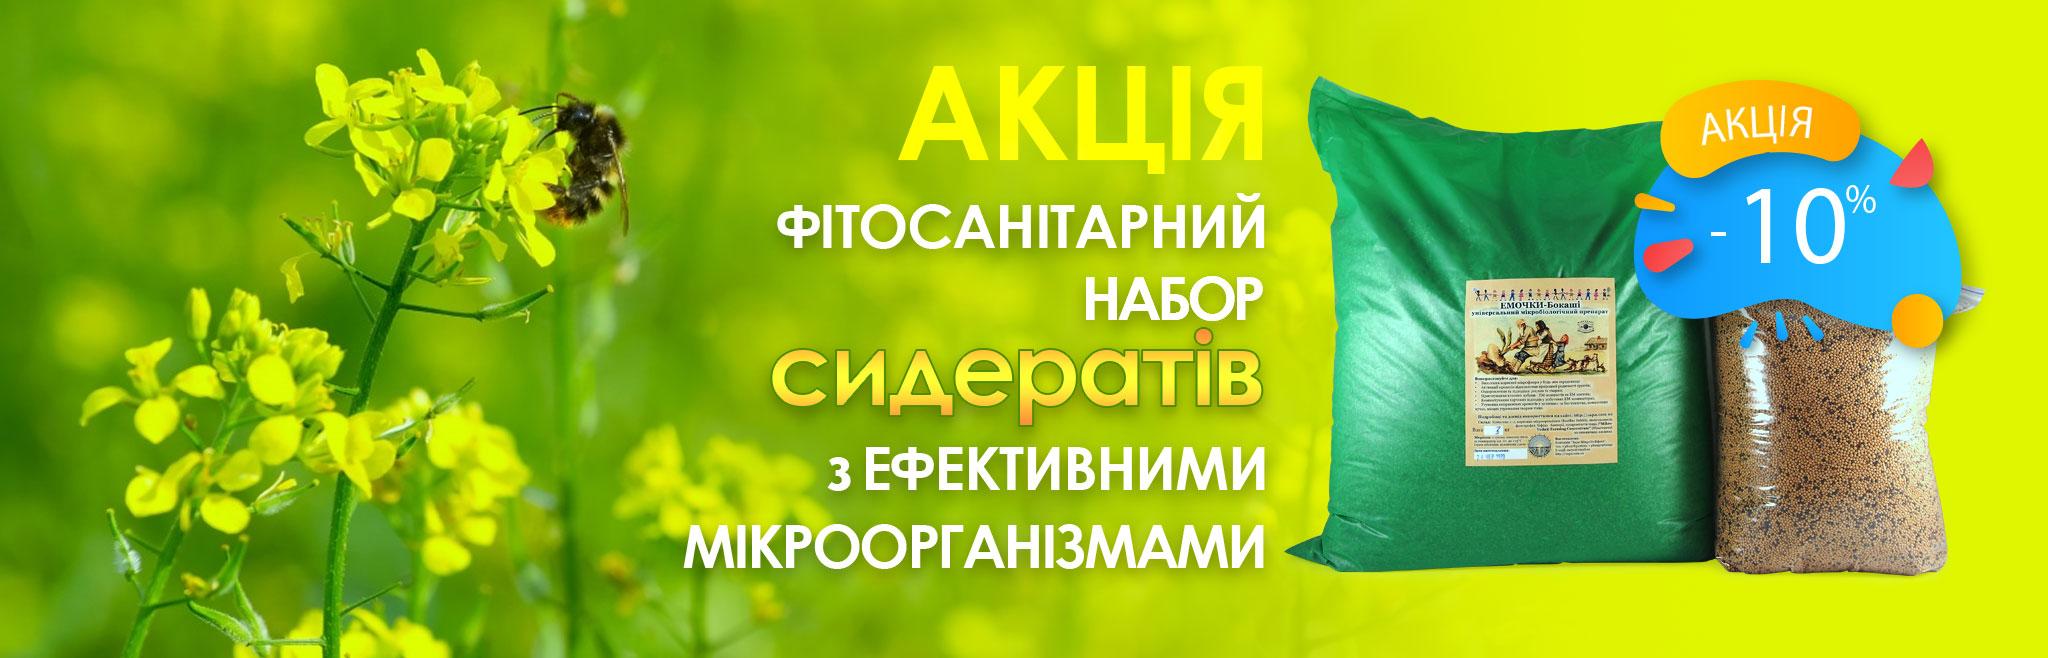 zarya banner 02 ukr - Зоря микробиоэффект купити бокаши, емочки, захист рослин, добрива